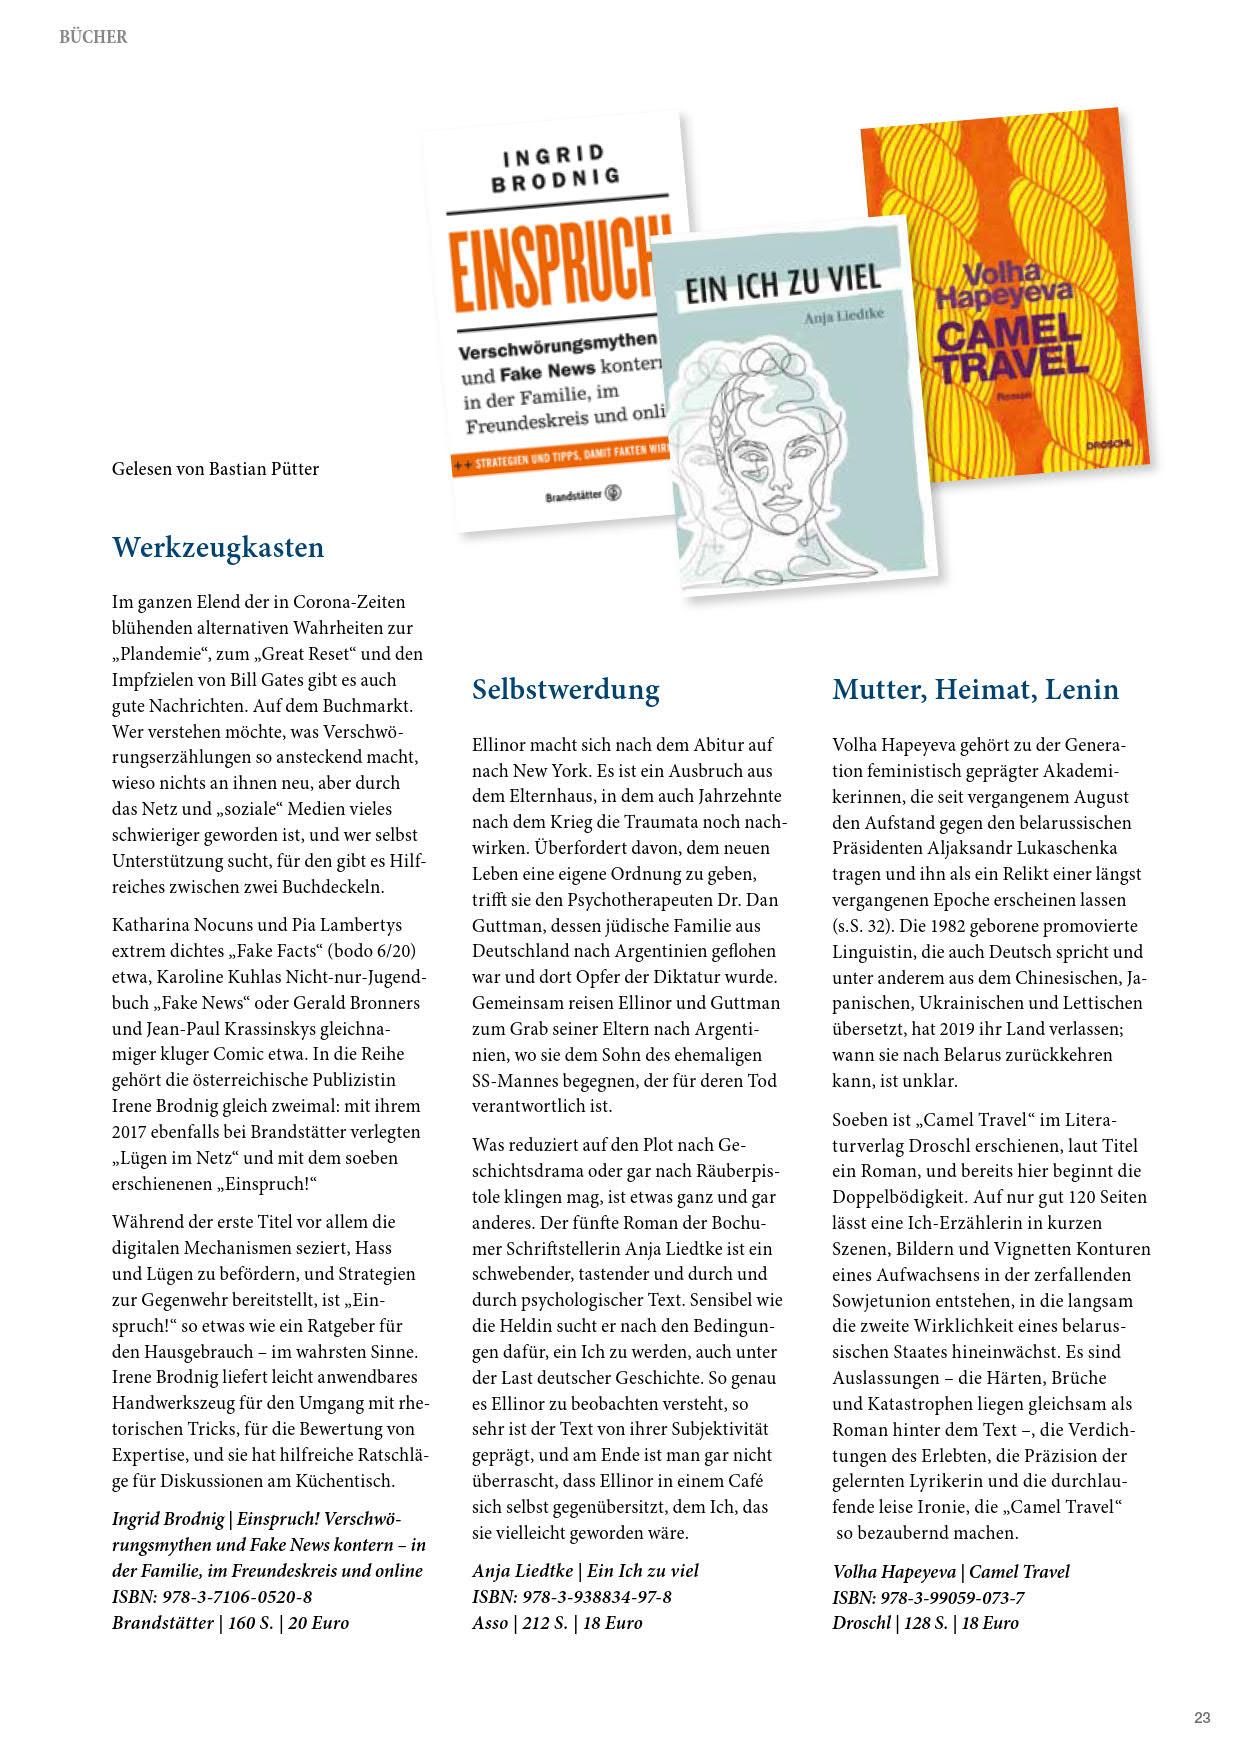 Seite 23_23